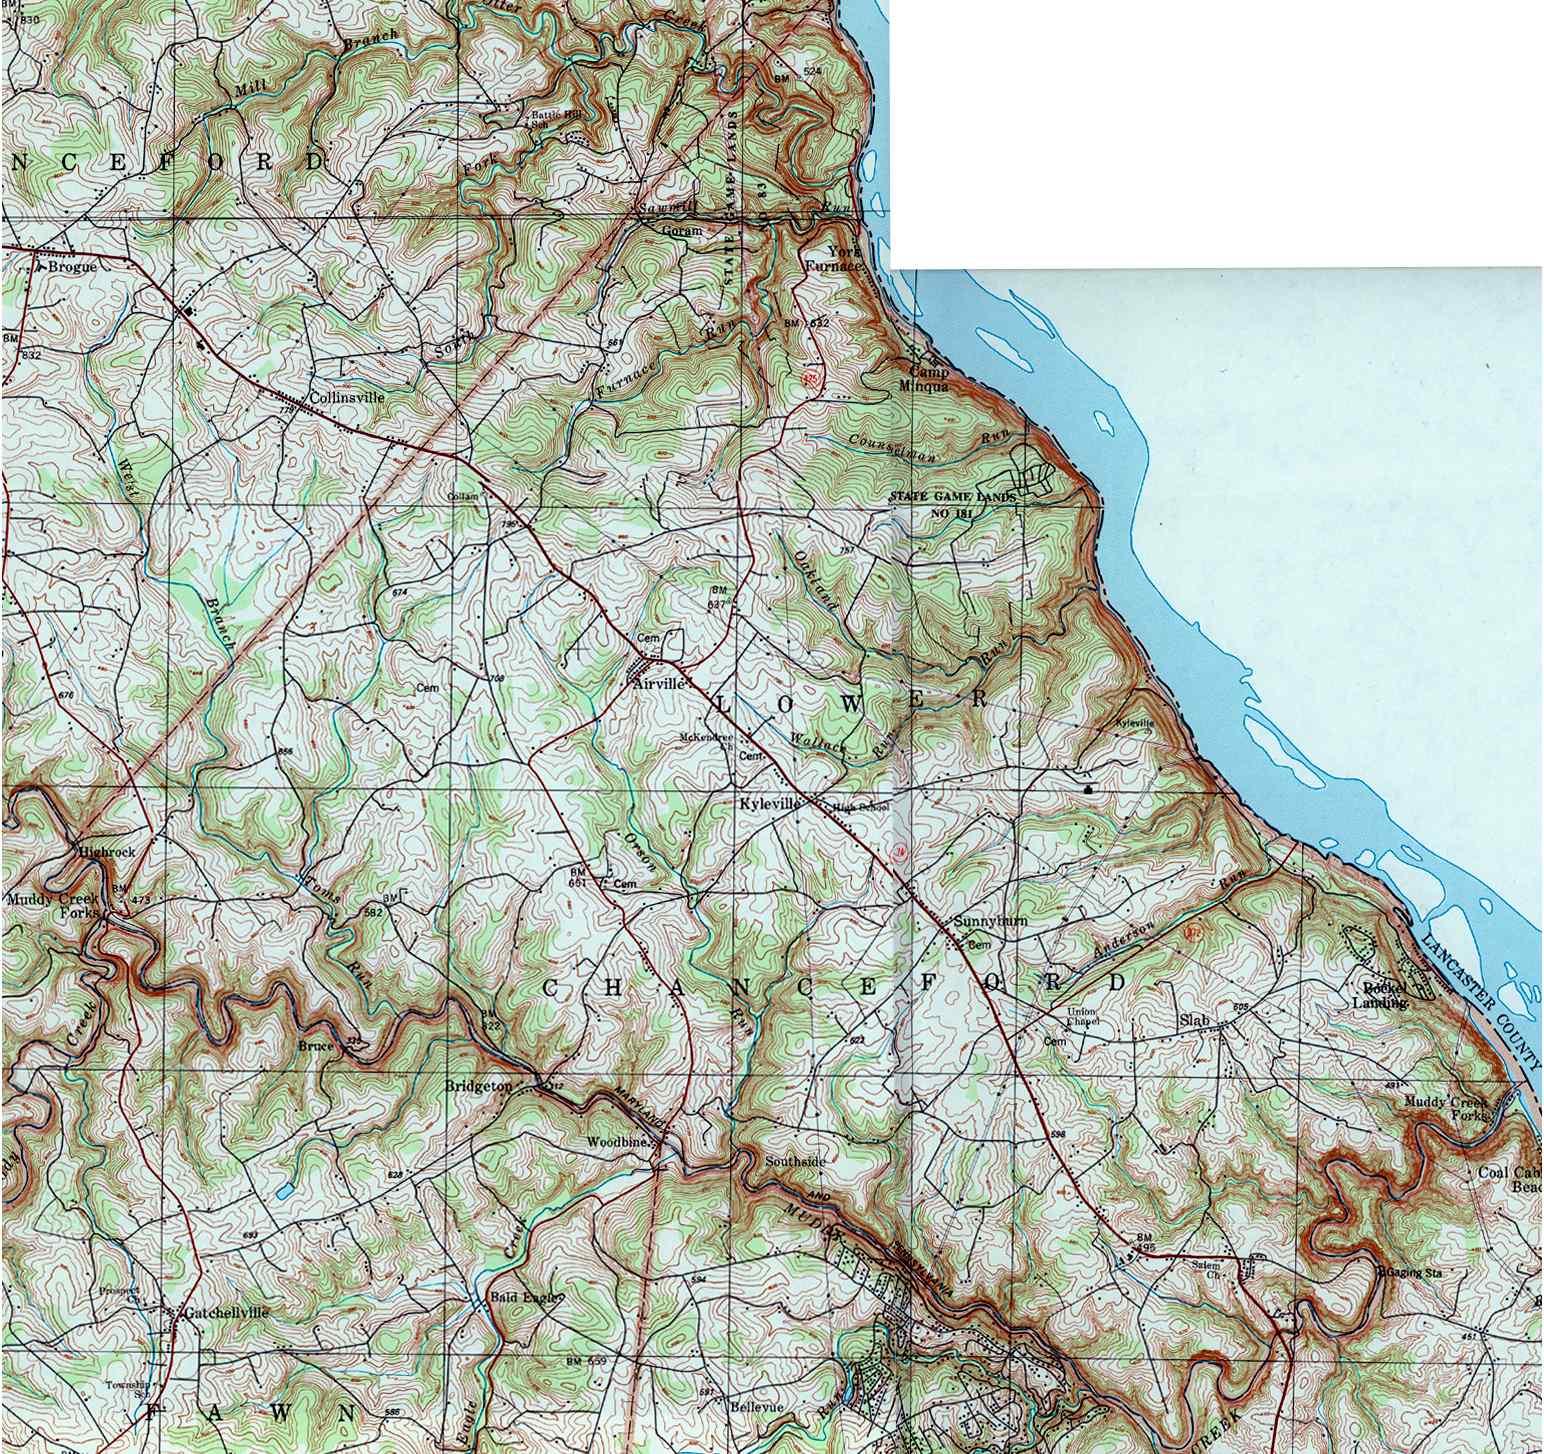 York County Pennsylvania Township Maps on york pa street map, york county pa driving map, pennsylvania borough map, york co map, york township pa ward map,